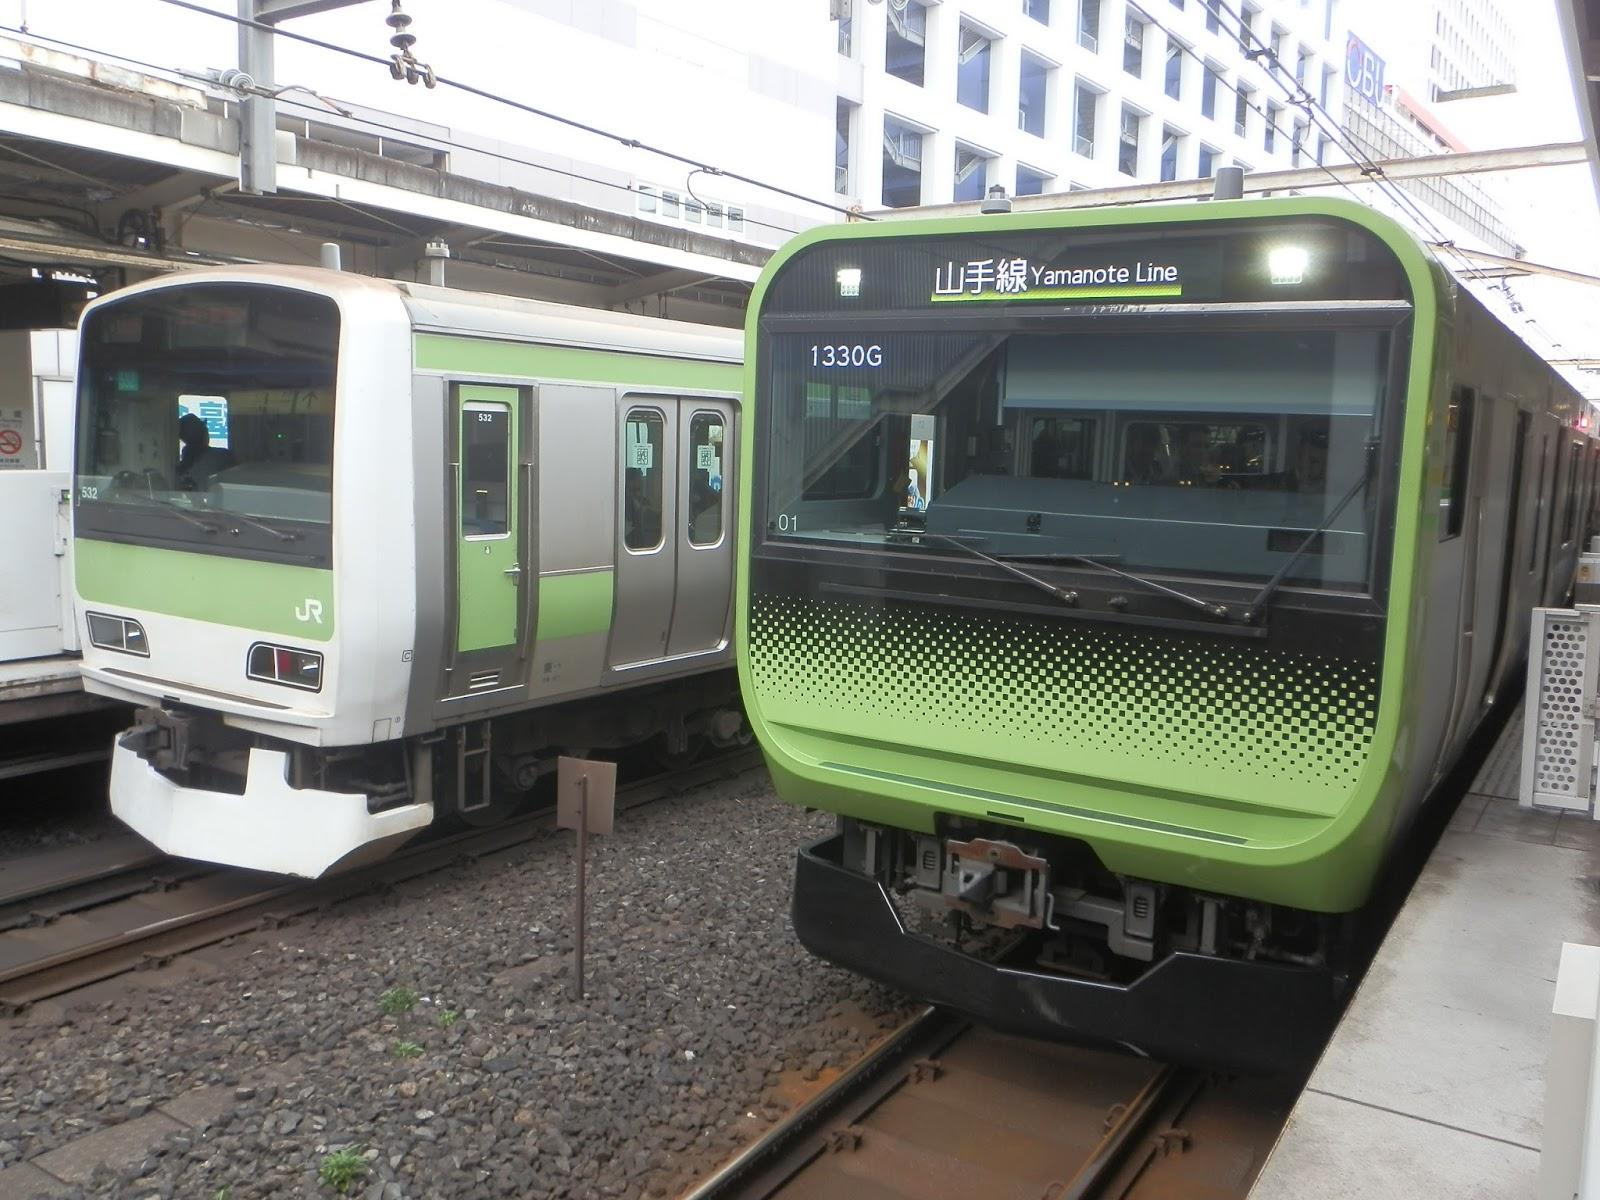 小田急沿線住み鉄道ファン日記: 【速報】東日本旅客鉄道E235系量産車の ...